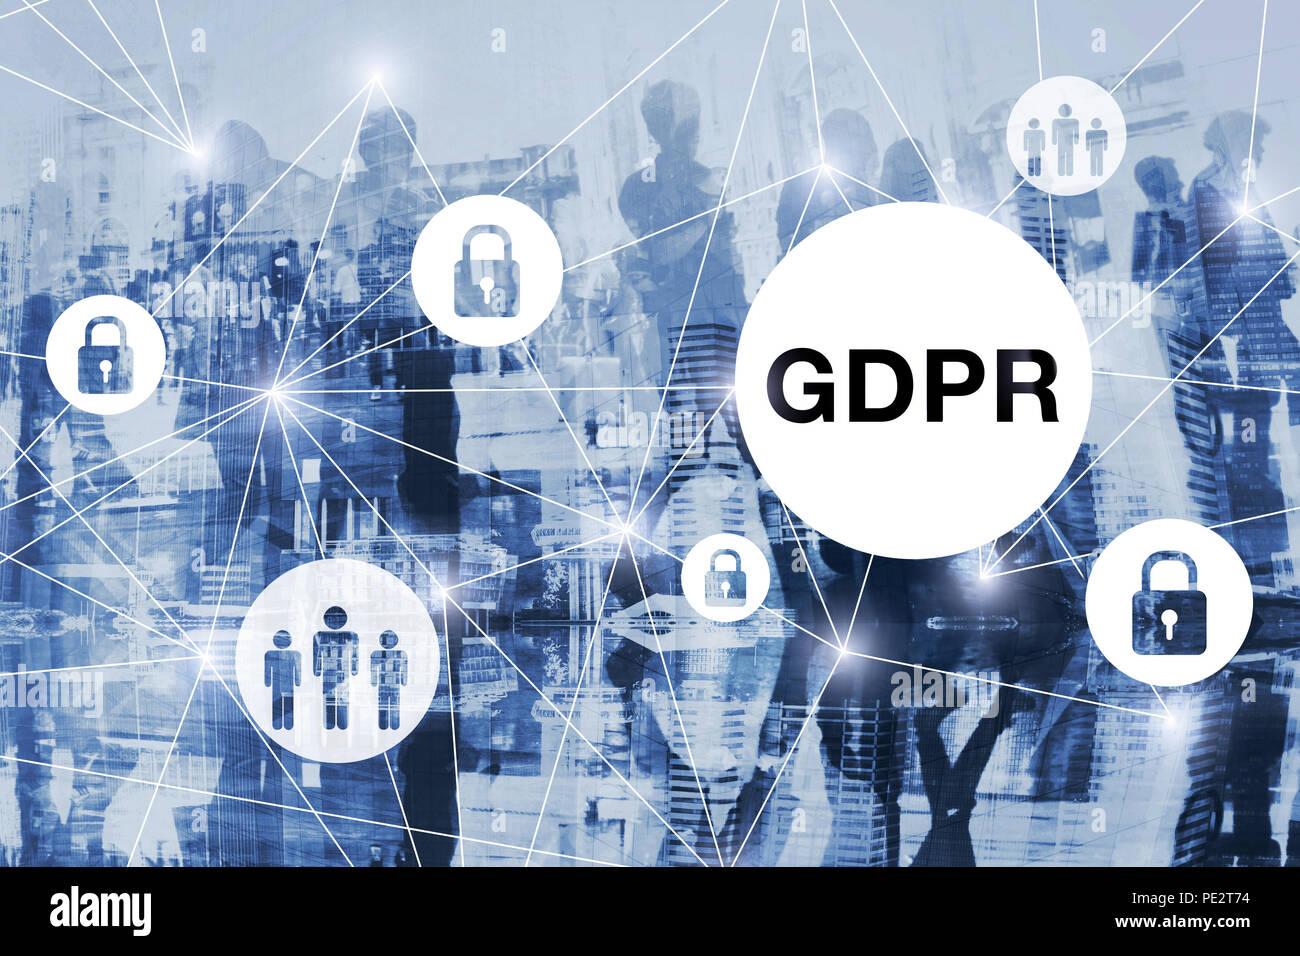 GDPR concept, general data protection regulation, blue background - Stock Image